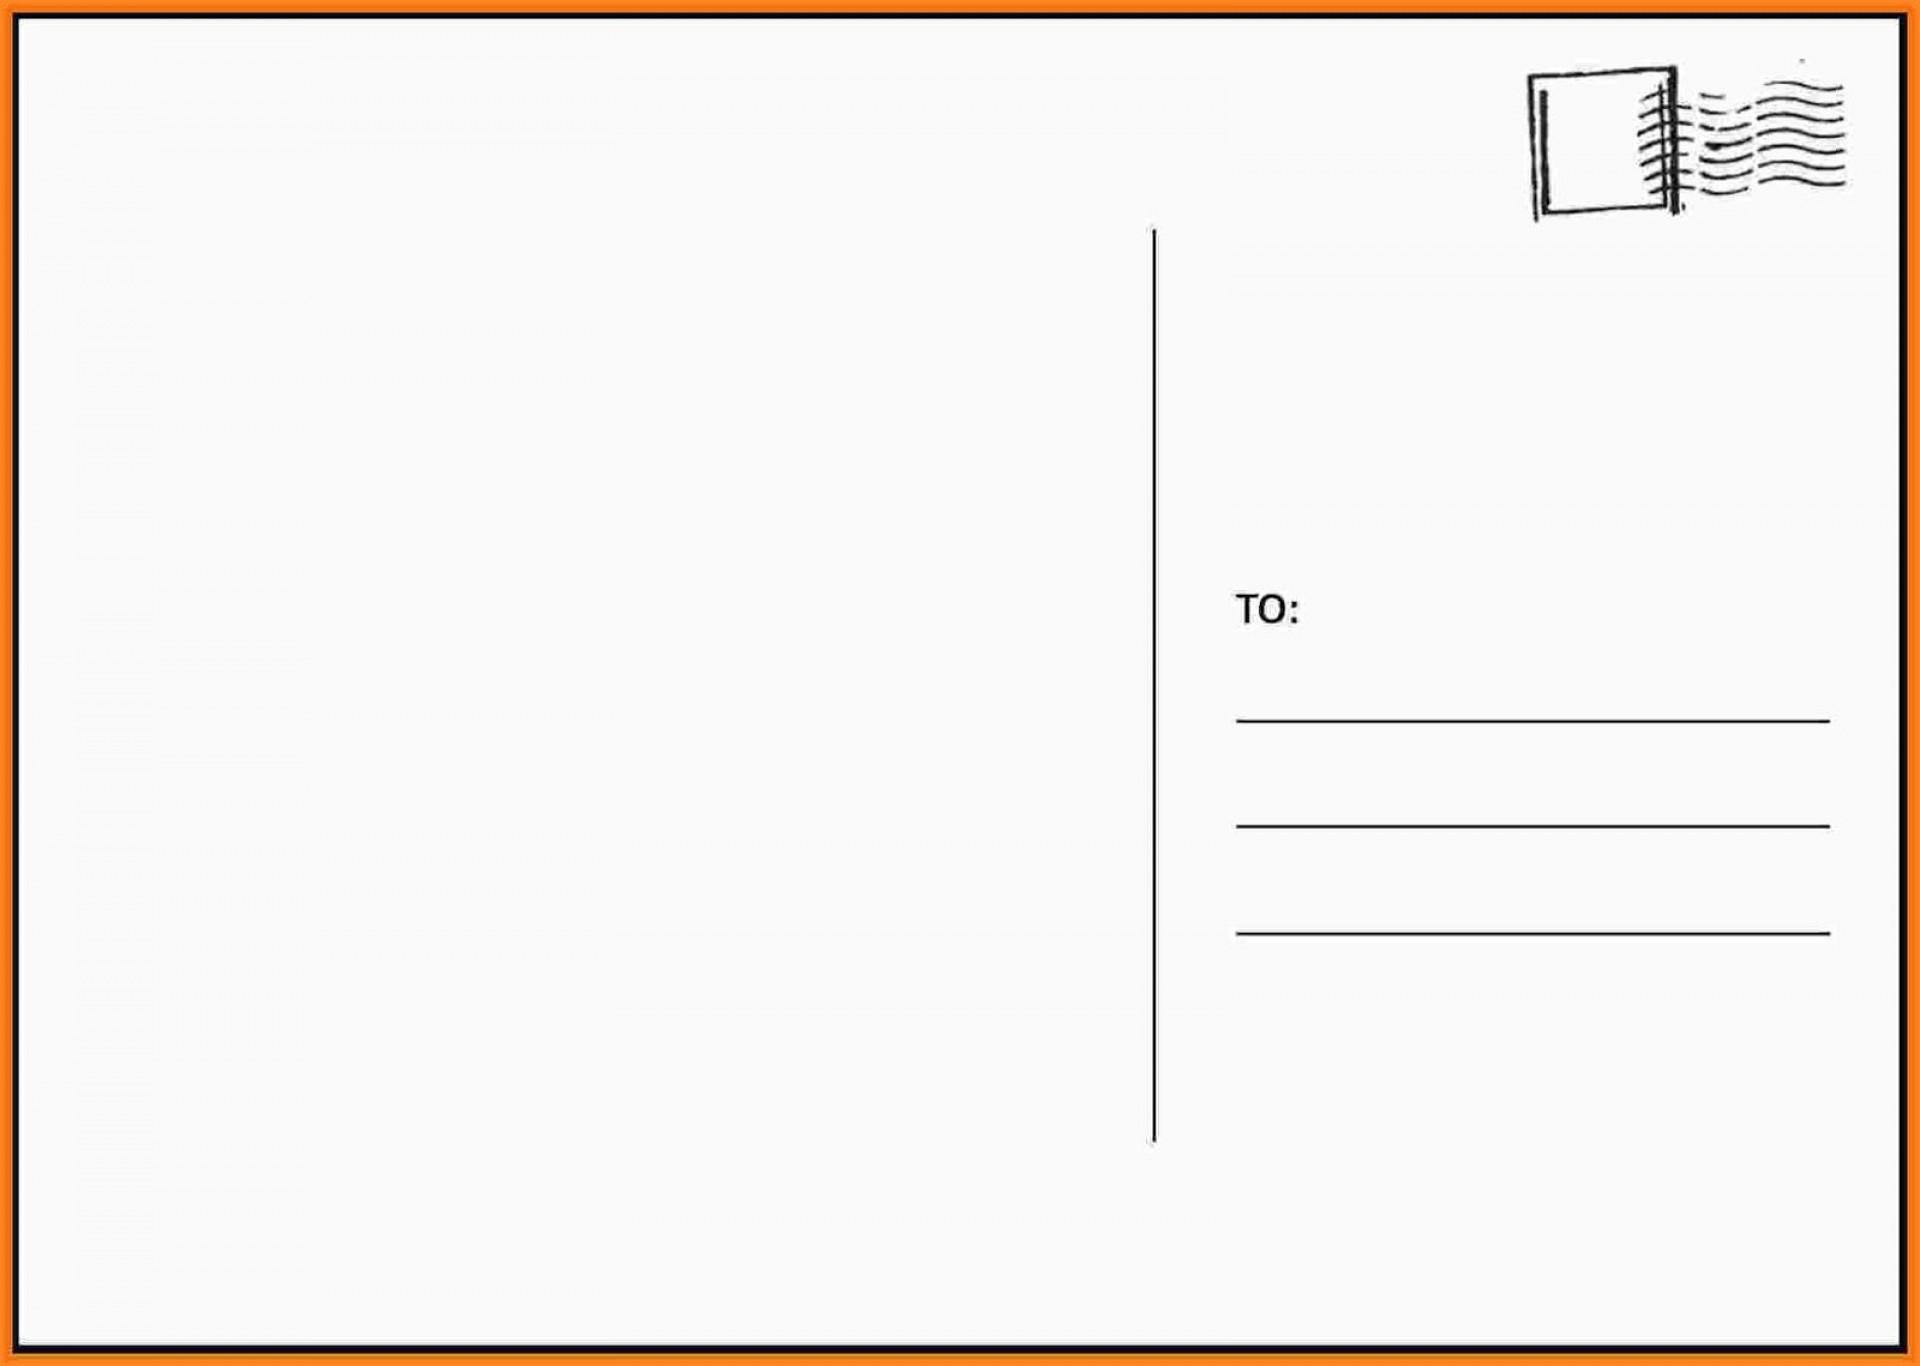 000 Frightening Busines Postcard Template Microsoft Word Sample 1920